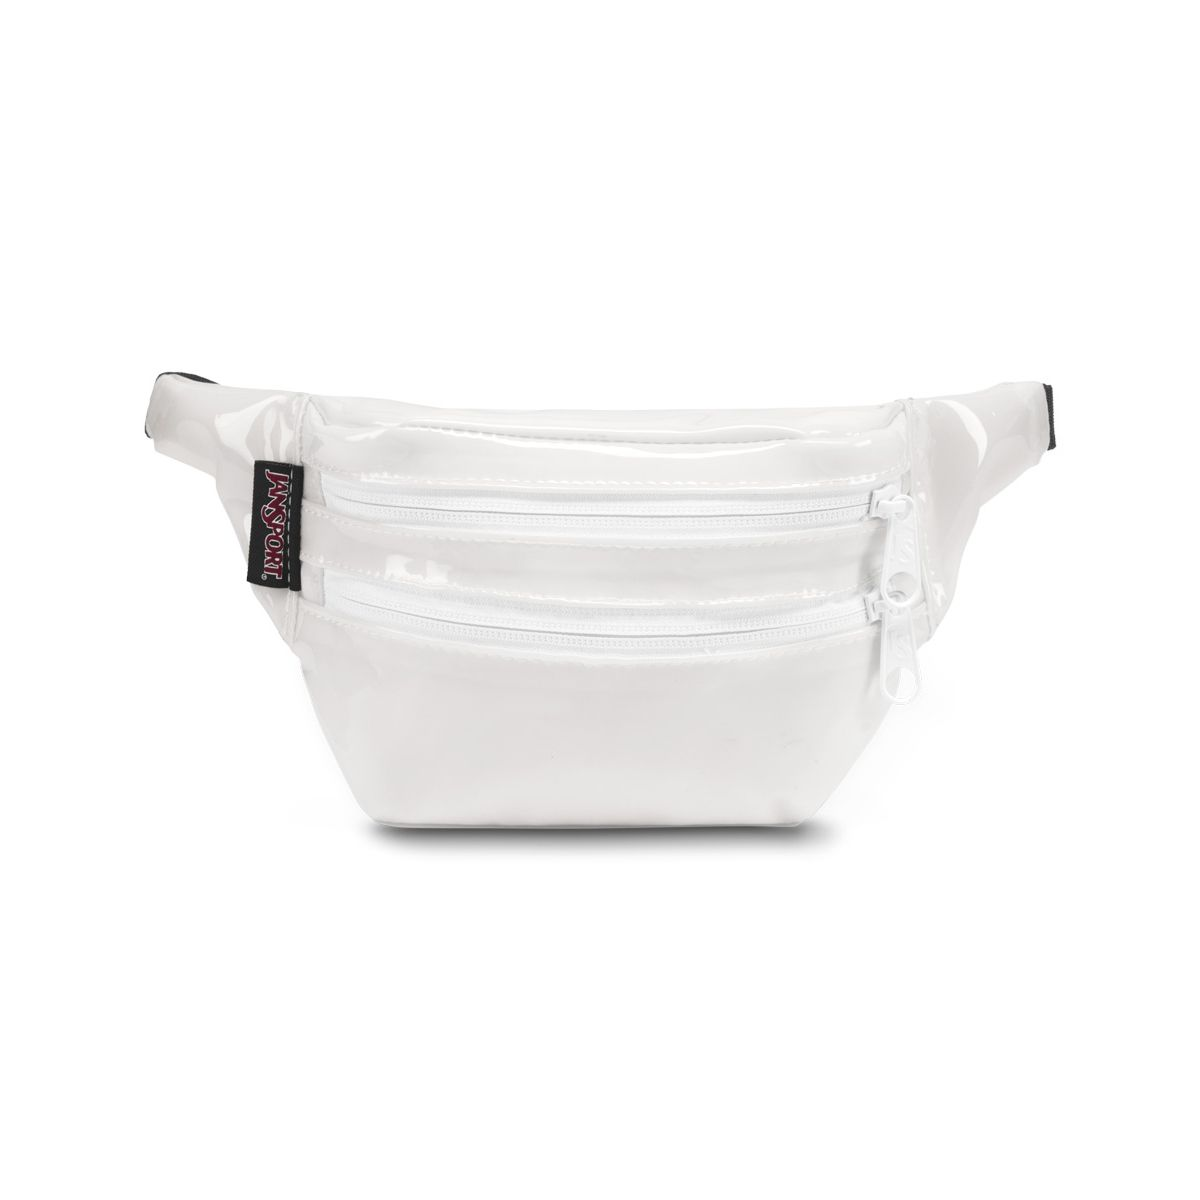 JanSport Hippyland Fanny Pack in Translucent White